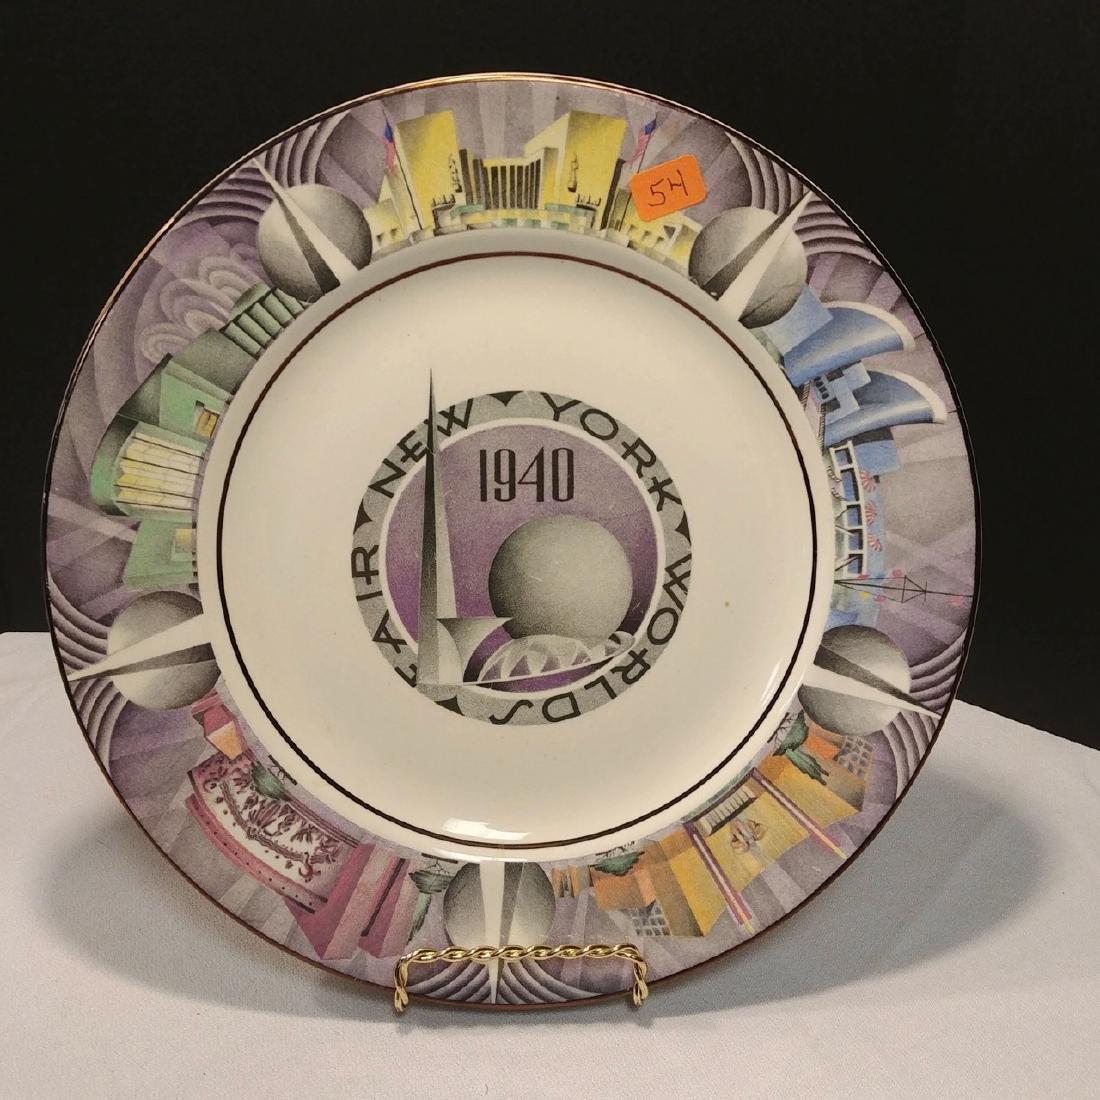 New York World's Fair, 1940 Plate